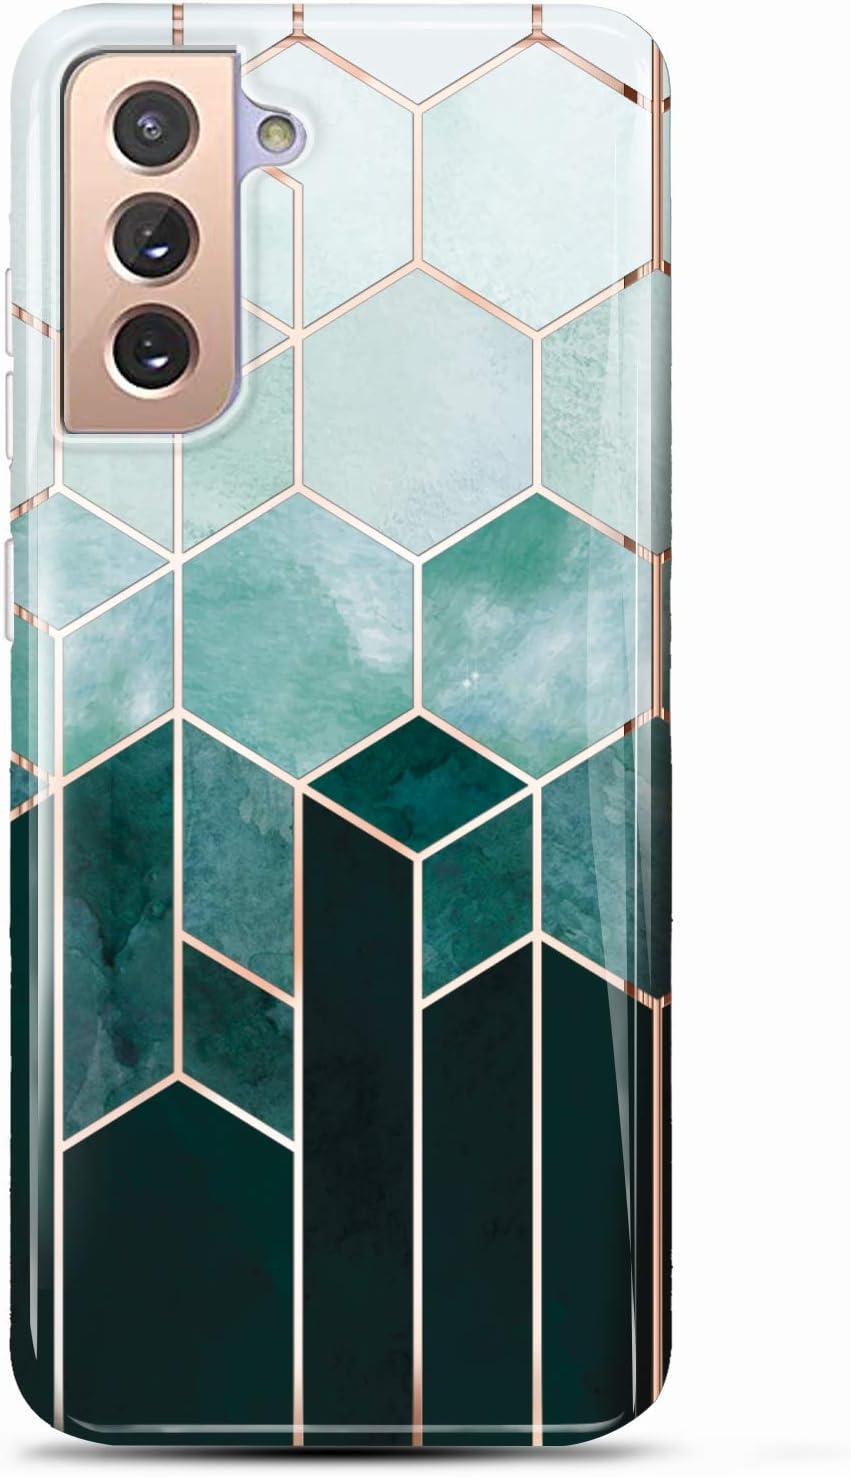 LUOLNH Galaxy S21 Case,Samsung Galaxy S21 Case Marble Brilliant Cute Design Shockproof Flexible Soft Silicone Rubber TPU Bumper Cover Skin Phone Case for Samsung S21 5G-Geometric Green Lattice